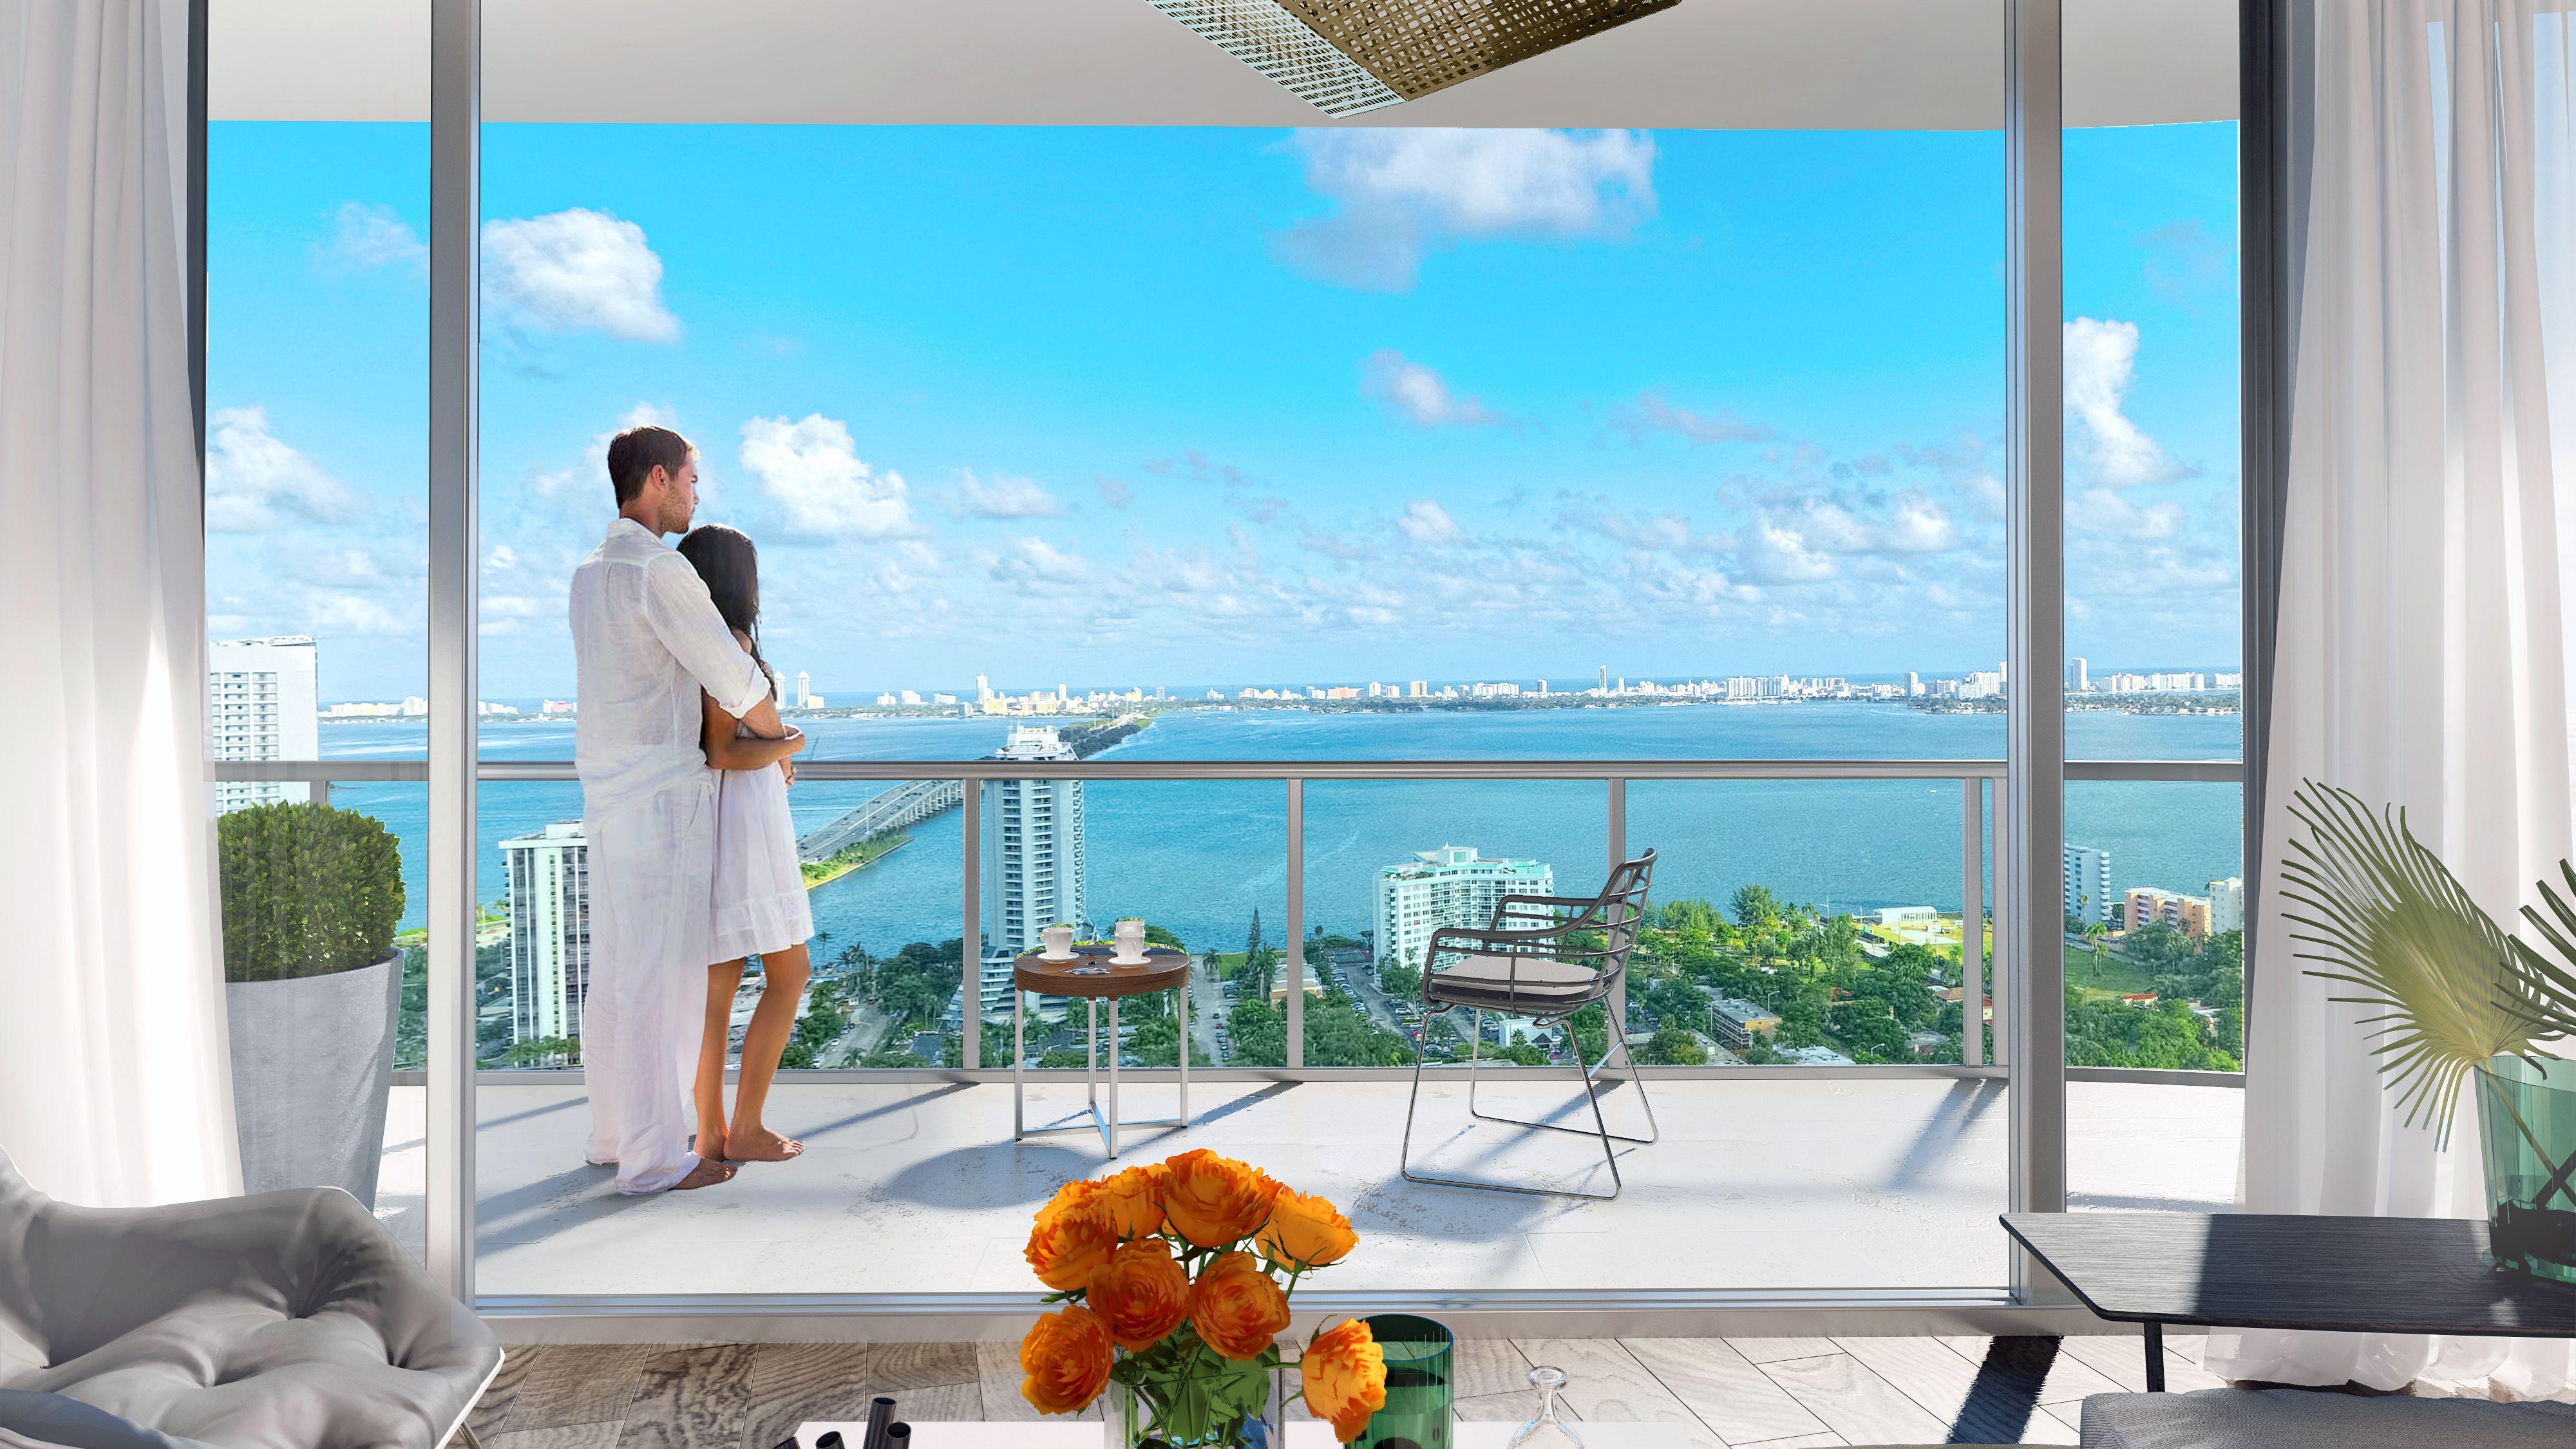 Hyde Midtown Miami Mia 1012 Apartments Miami Downtown New Construction Penthouse Real Estate Pictures Midtown Luxury Real Estate